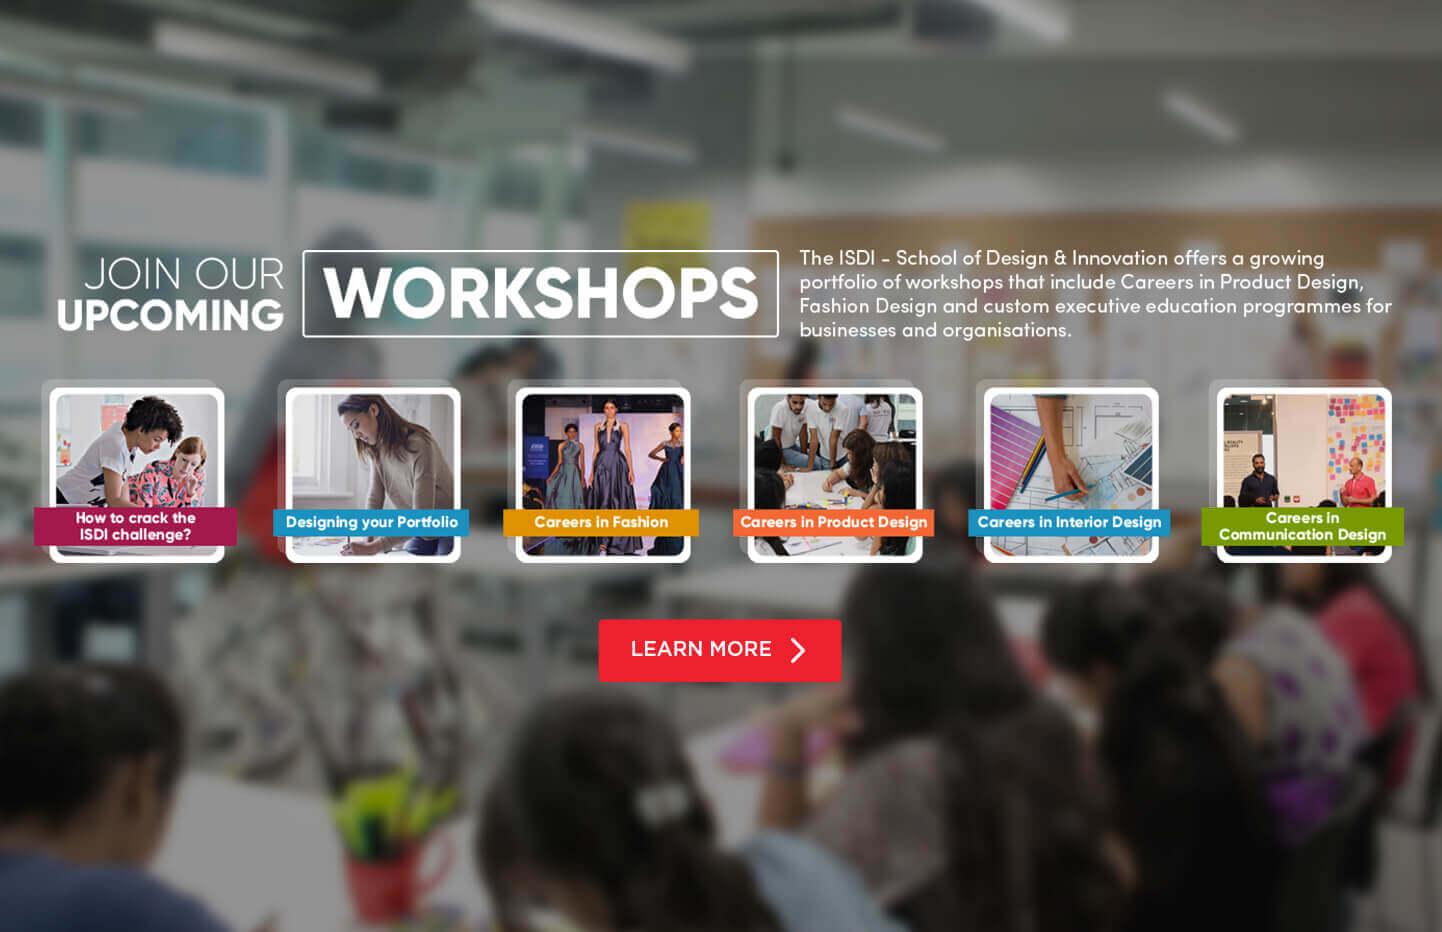 Workshops and Webinars at ISDI